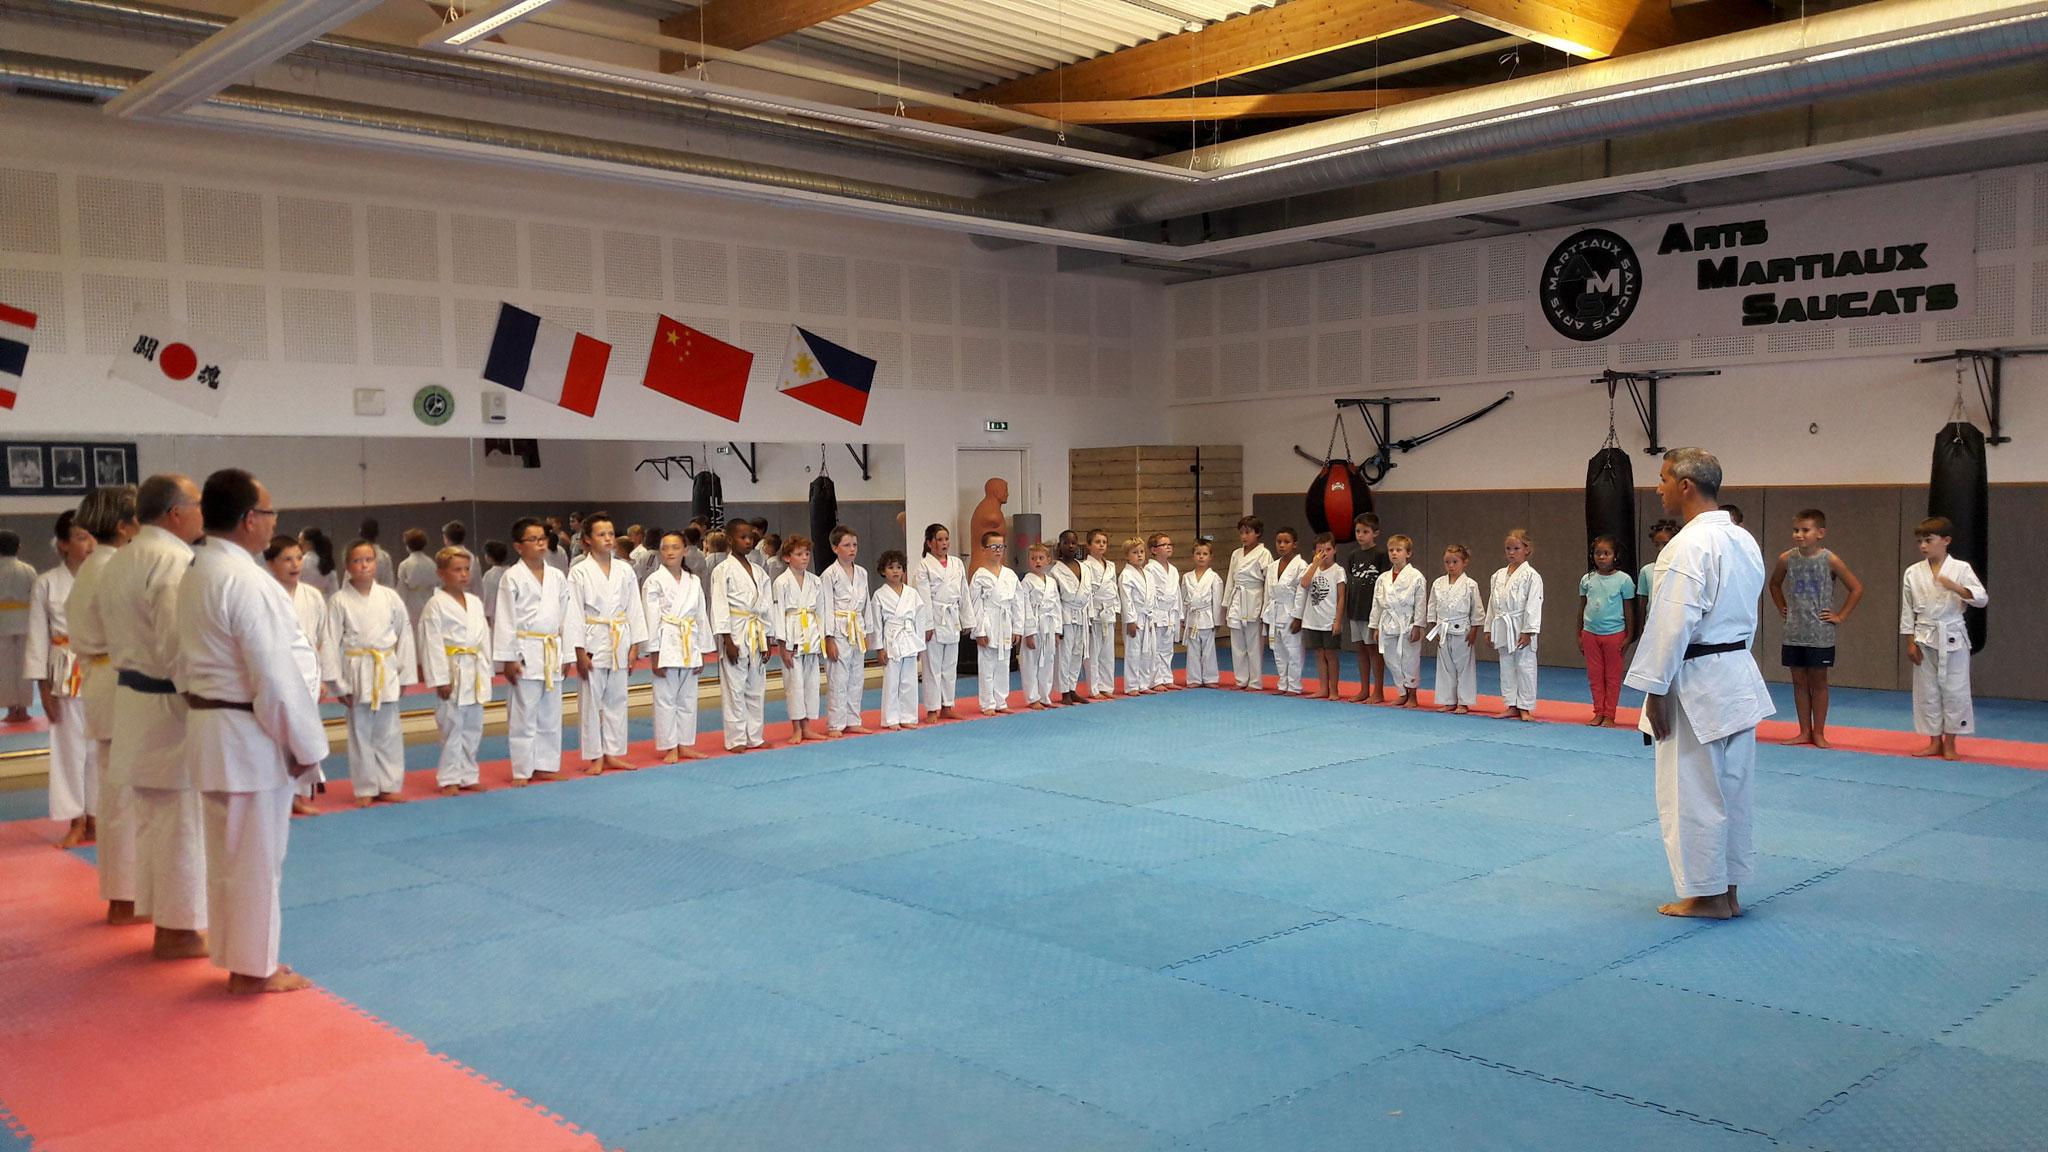 arts-martiaux-saucats-karate-do-5